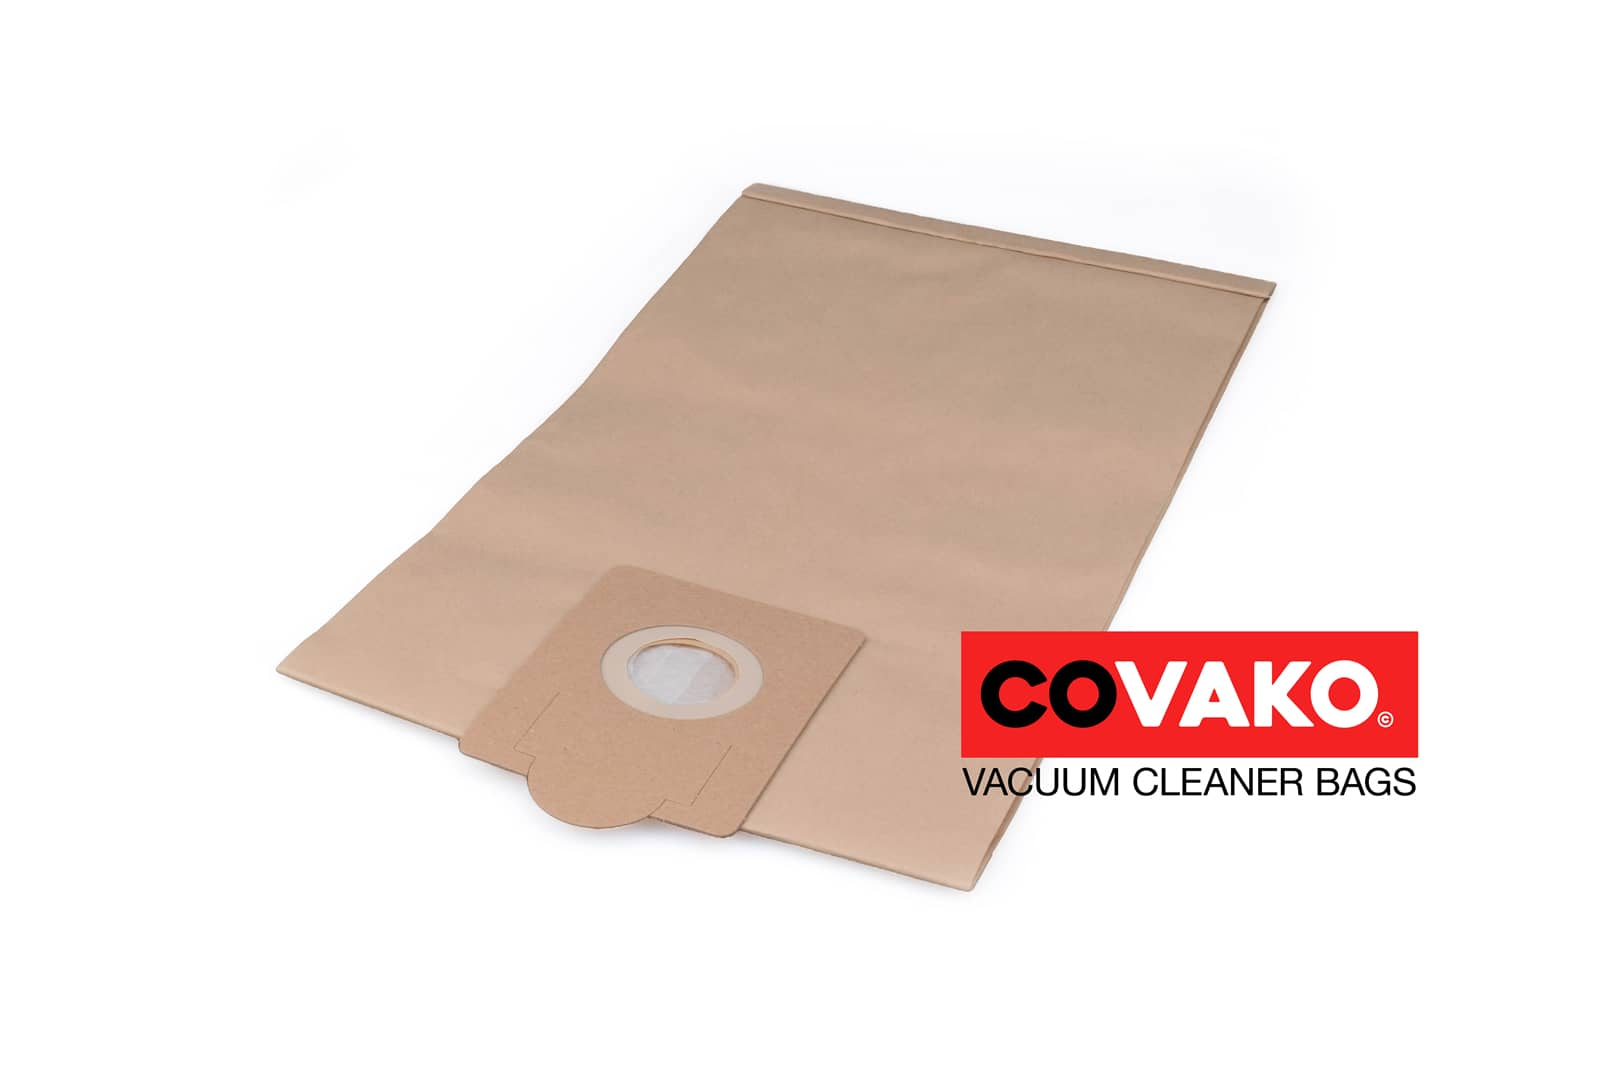 Hako Clean 7231 / Papier - Hako Staubsaugerbeutel